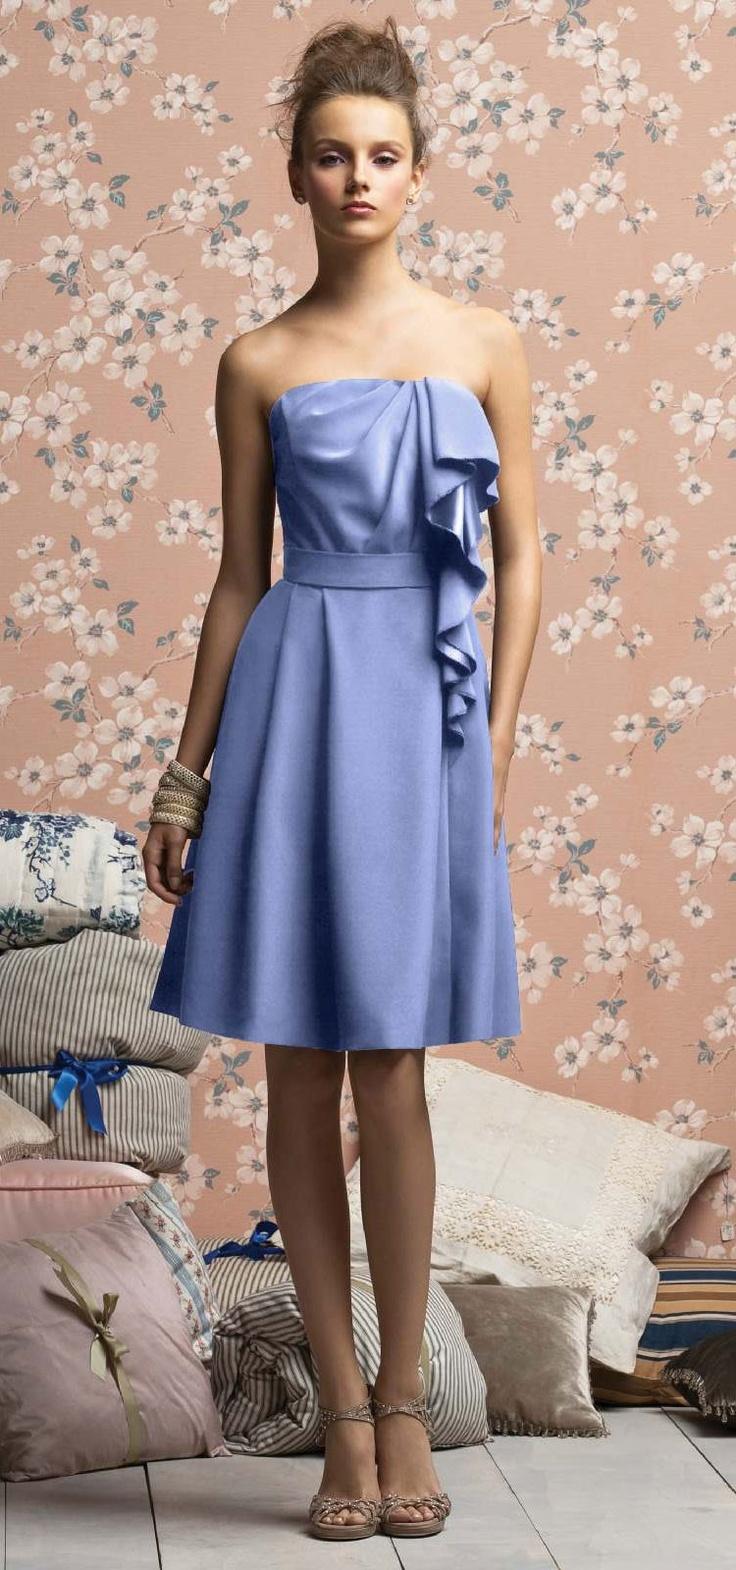 Best 25 periwinkle bridesmaid dresses ideas on pinterest periwinkle bridesmaid periwinkle bridesmaid dressescream weddingblue ombrellifo Images